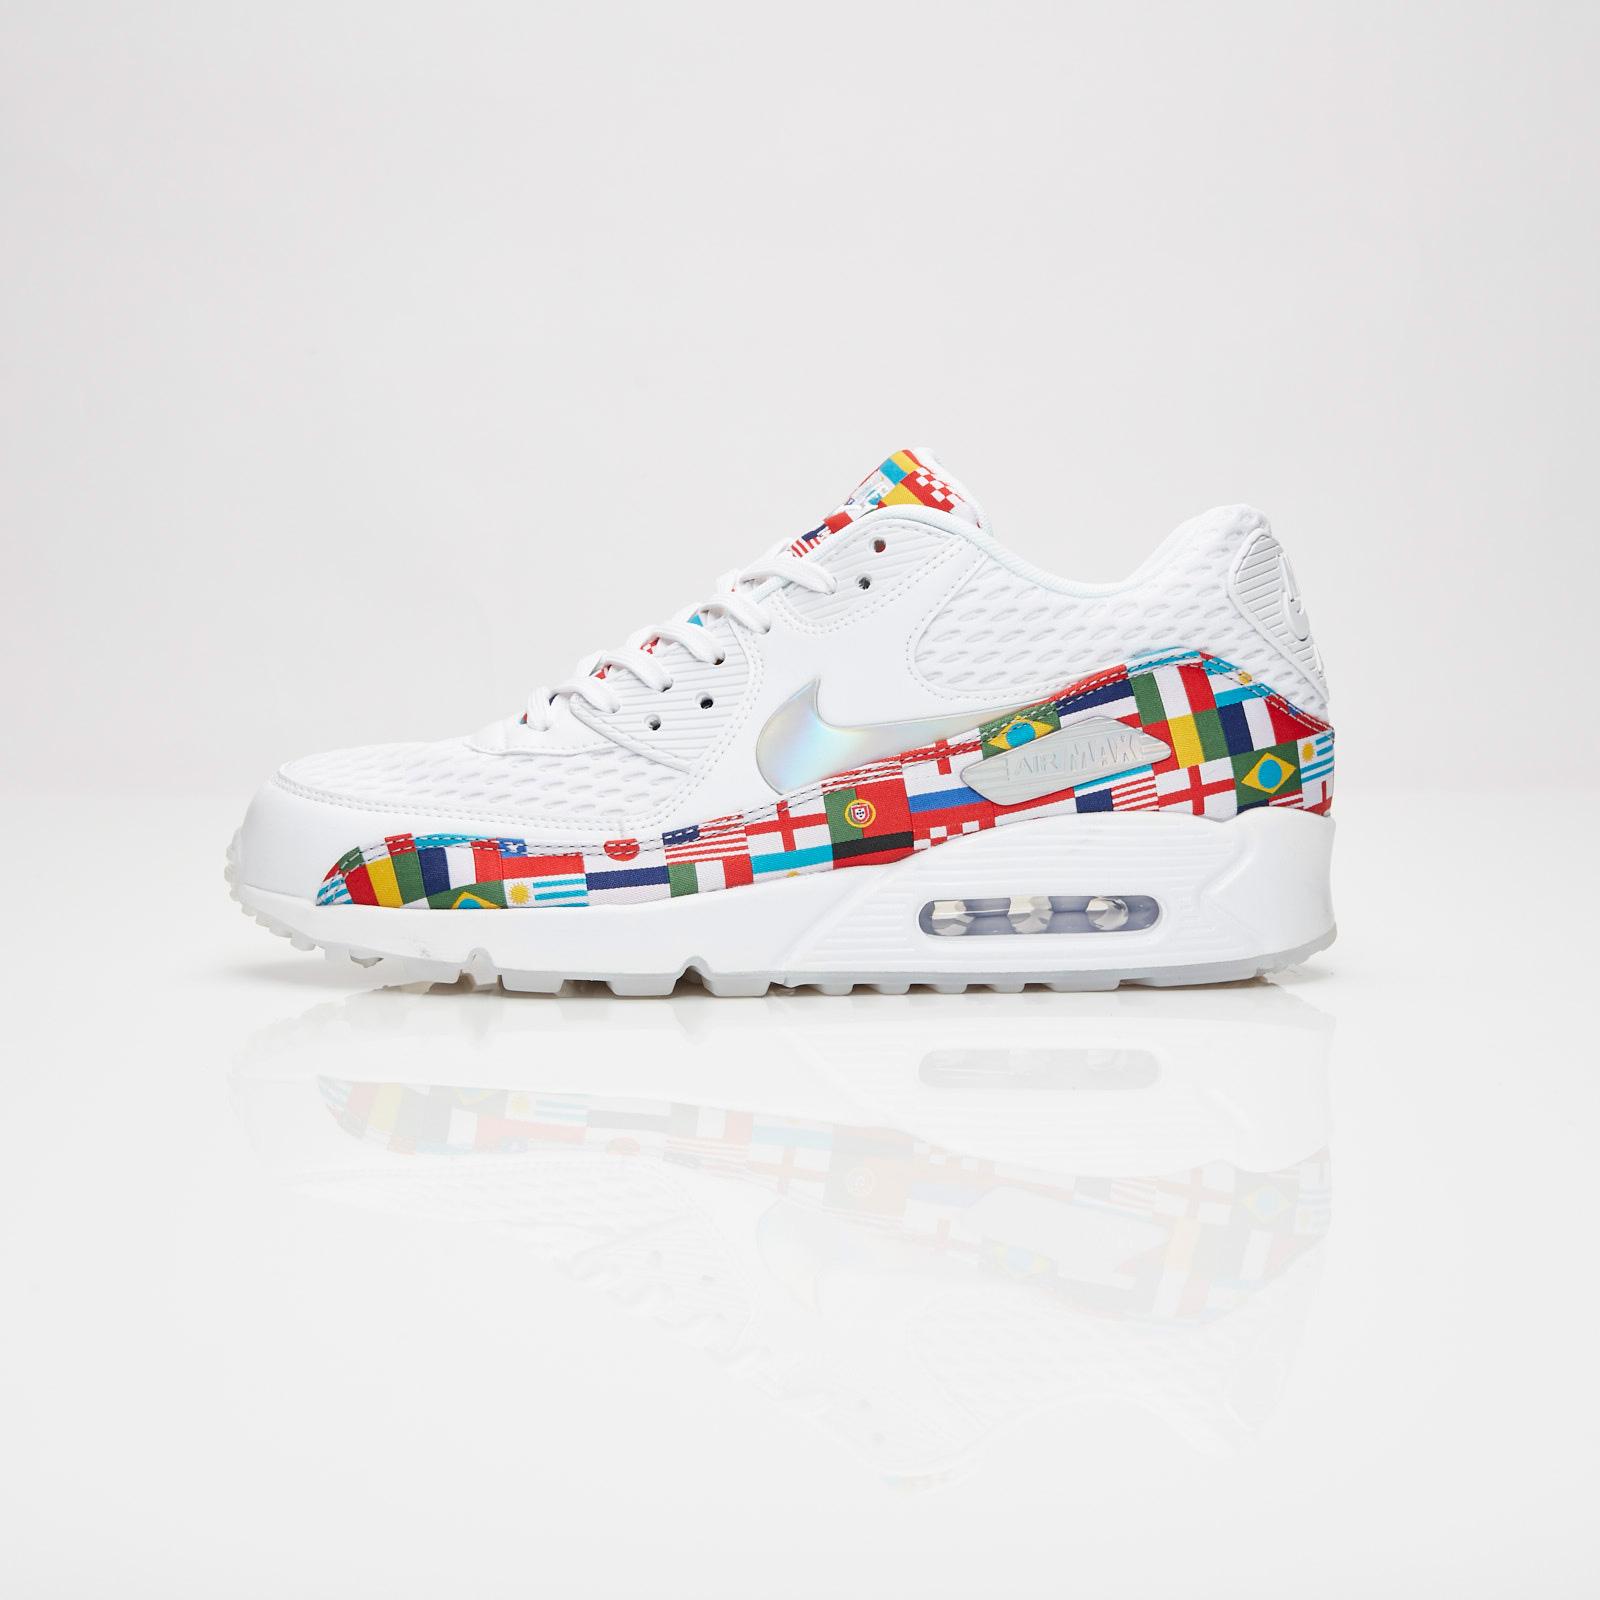 Nike Air Max 90 NIC QS - Ao5119-100 - SNS   sneakers & streetwear ...